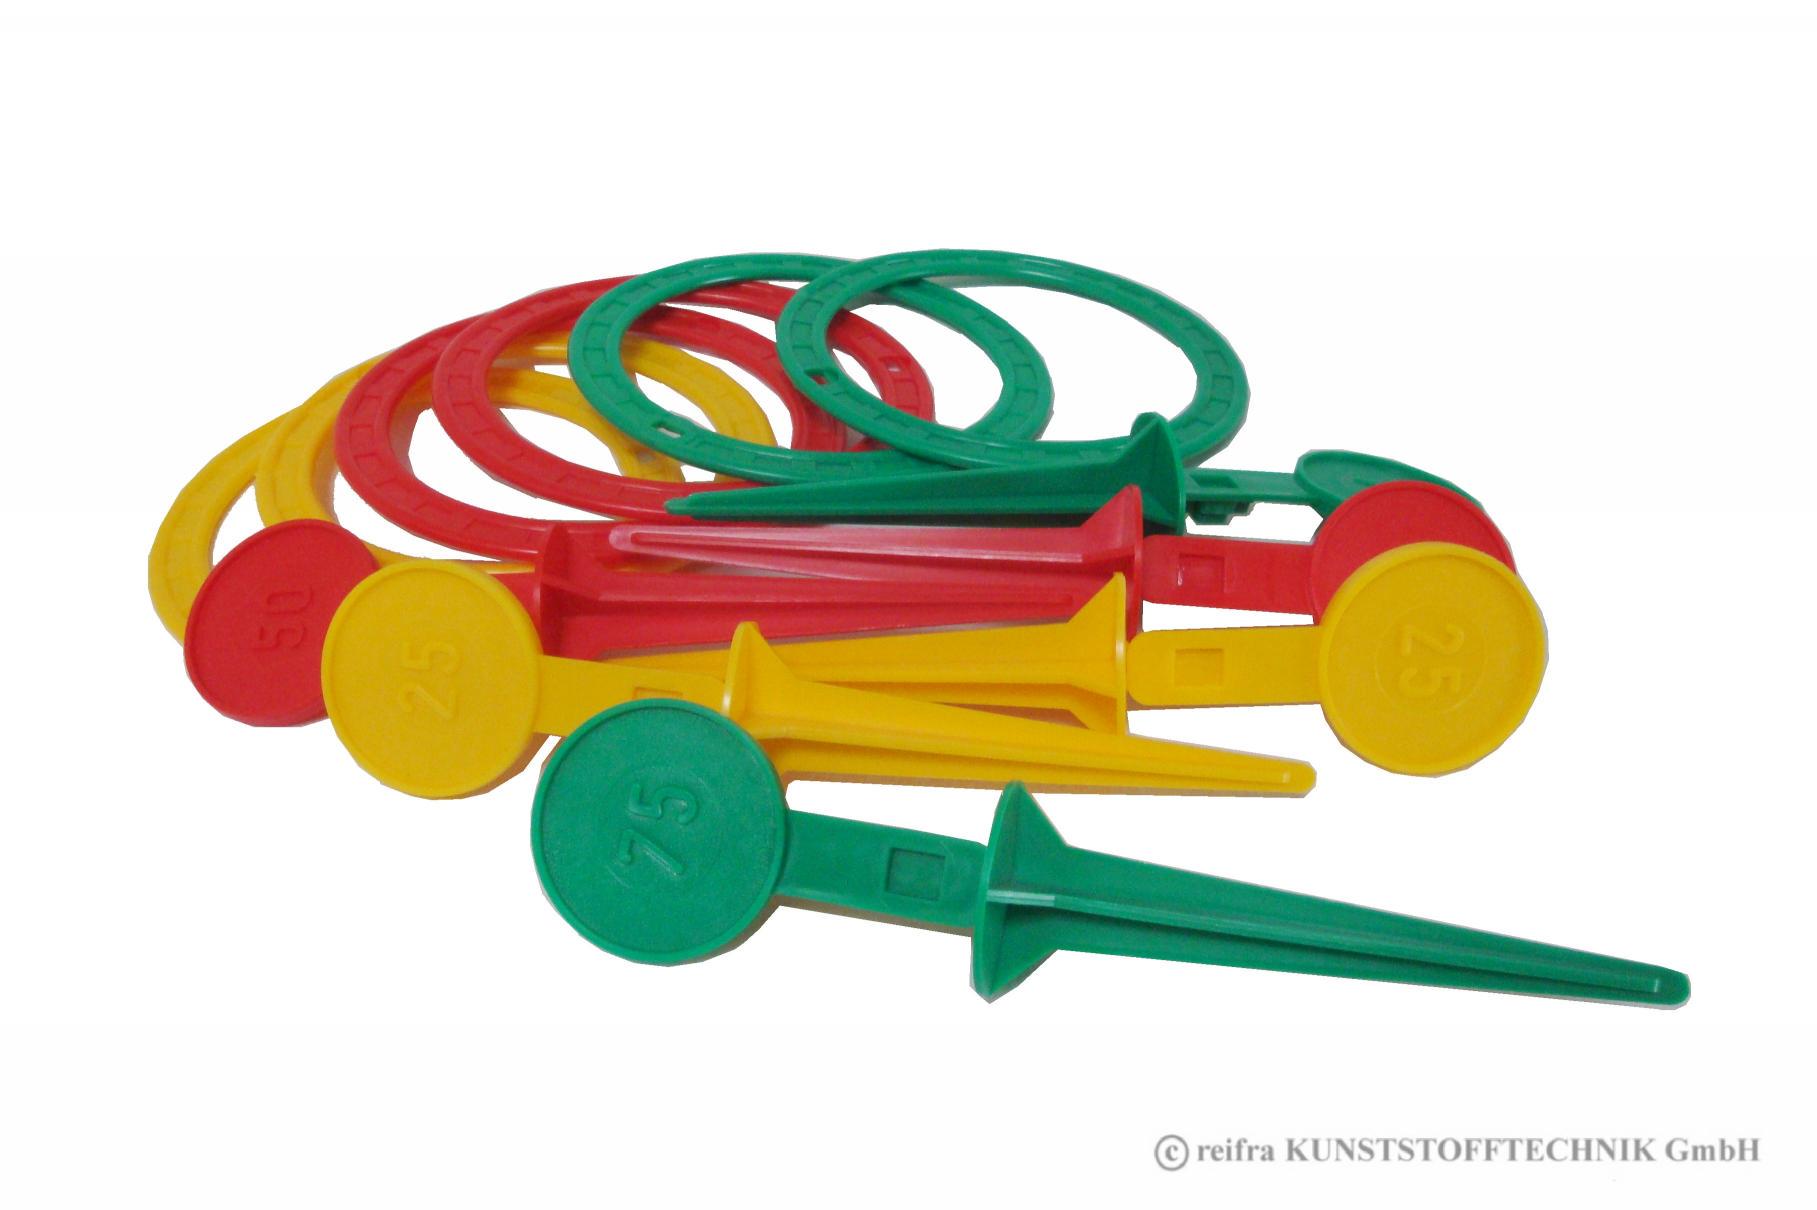 ringwurfspiel sandspielzeug weitere spielwaren online shop reifra kunststofftechnik gmbh. Black Bedroom Furniture Sets. Home Design Ideas